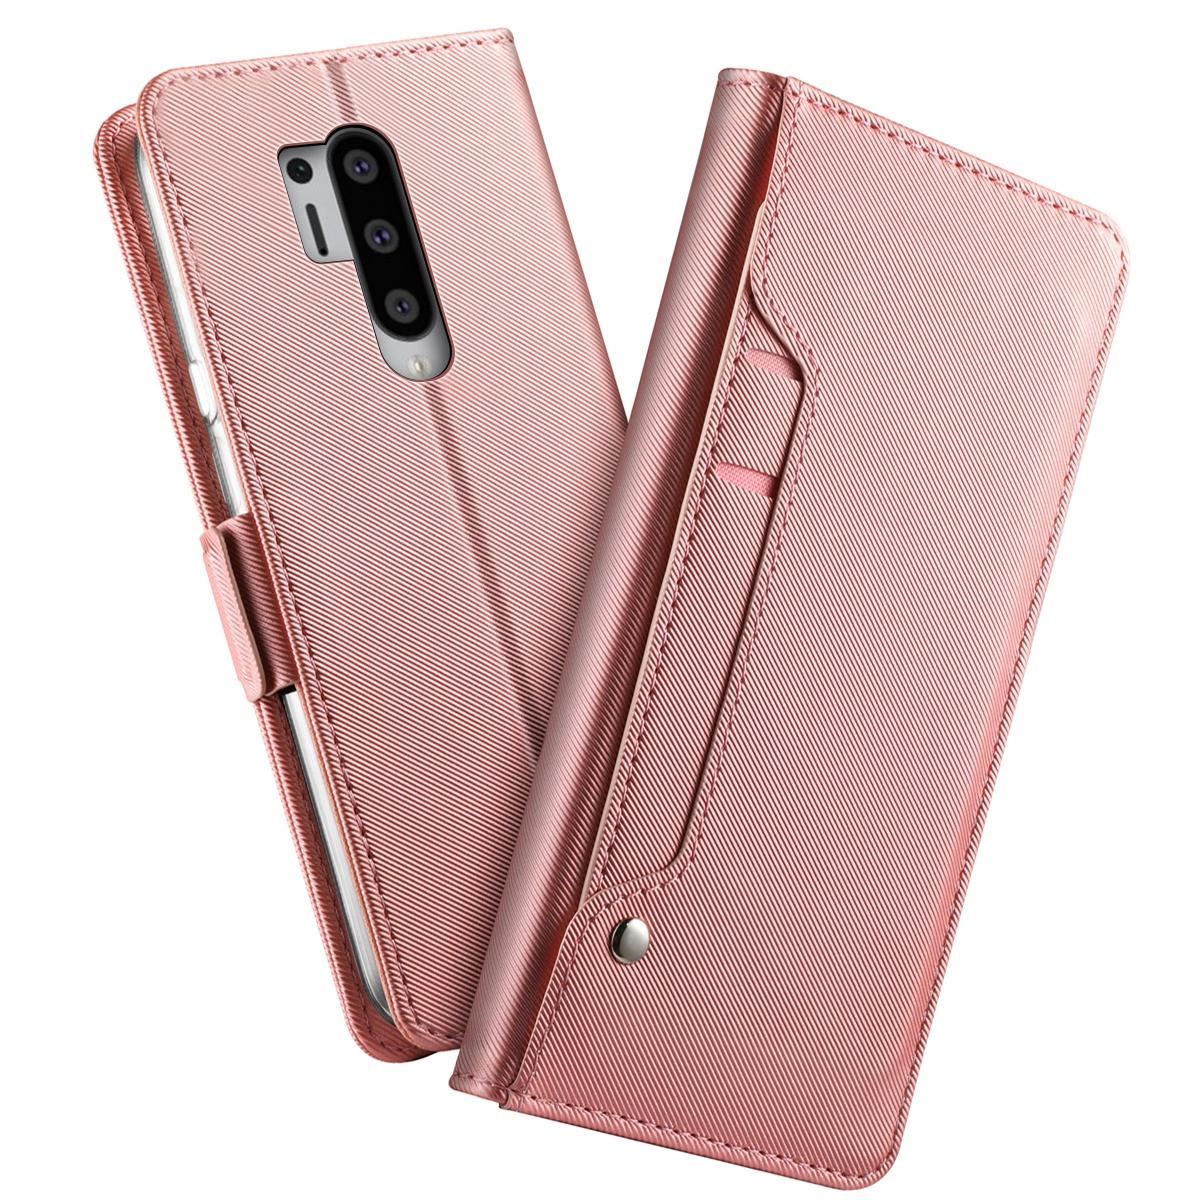 Plånboksfodral Spegel OnePlus 8 Pro Rosa Guld